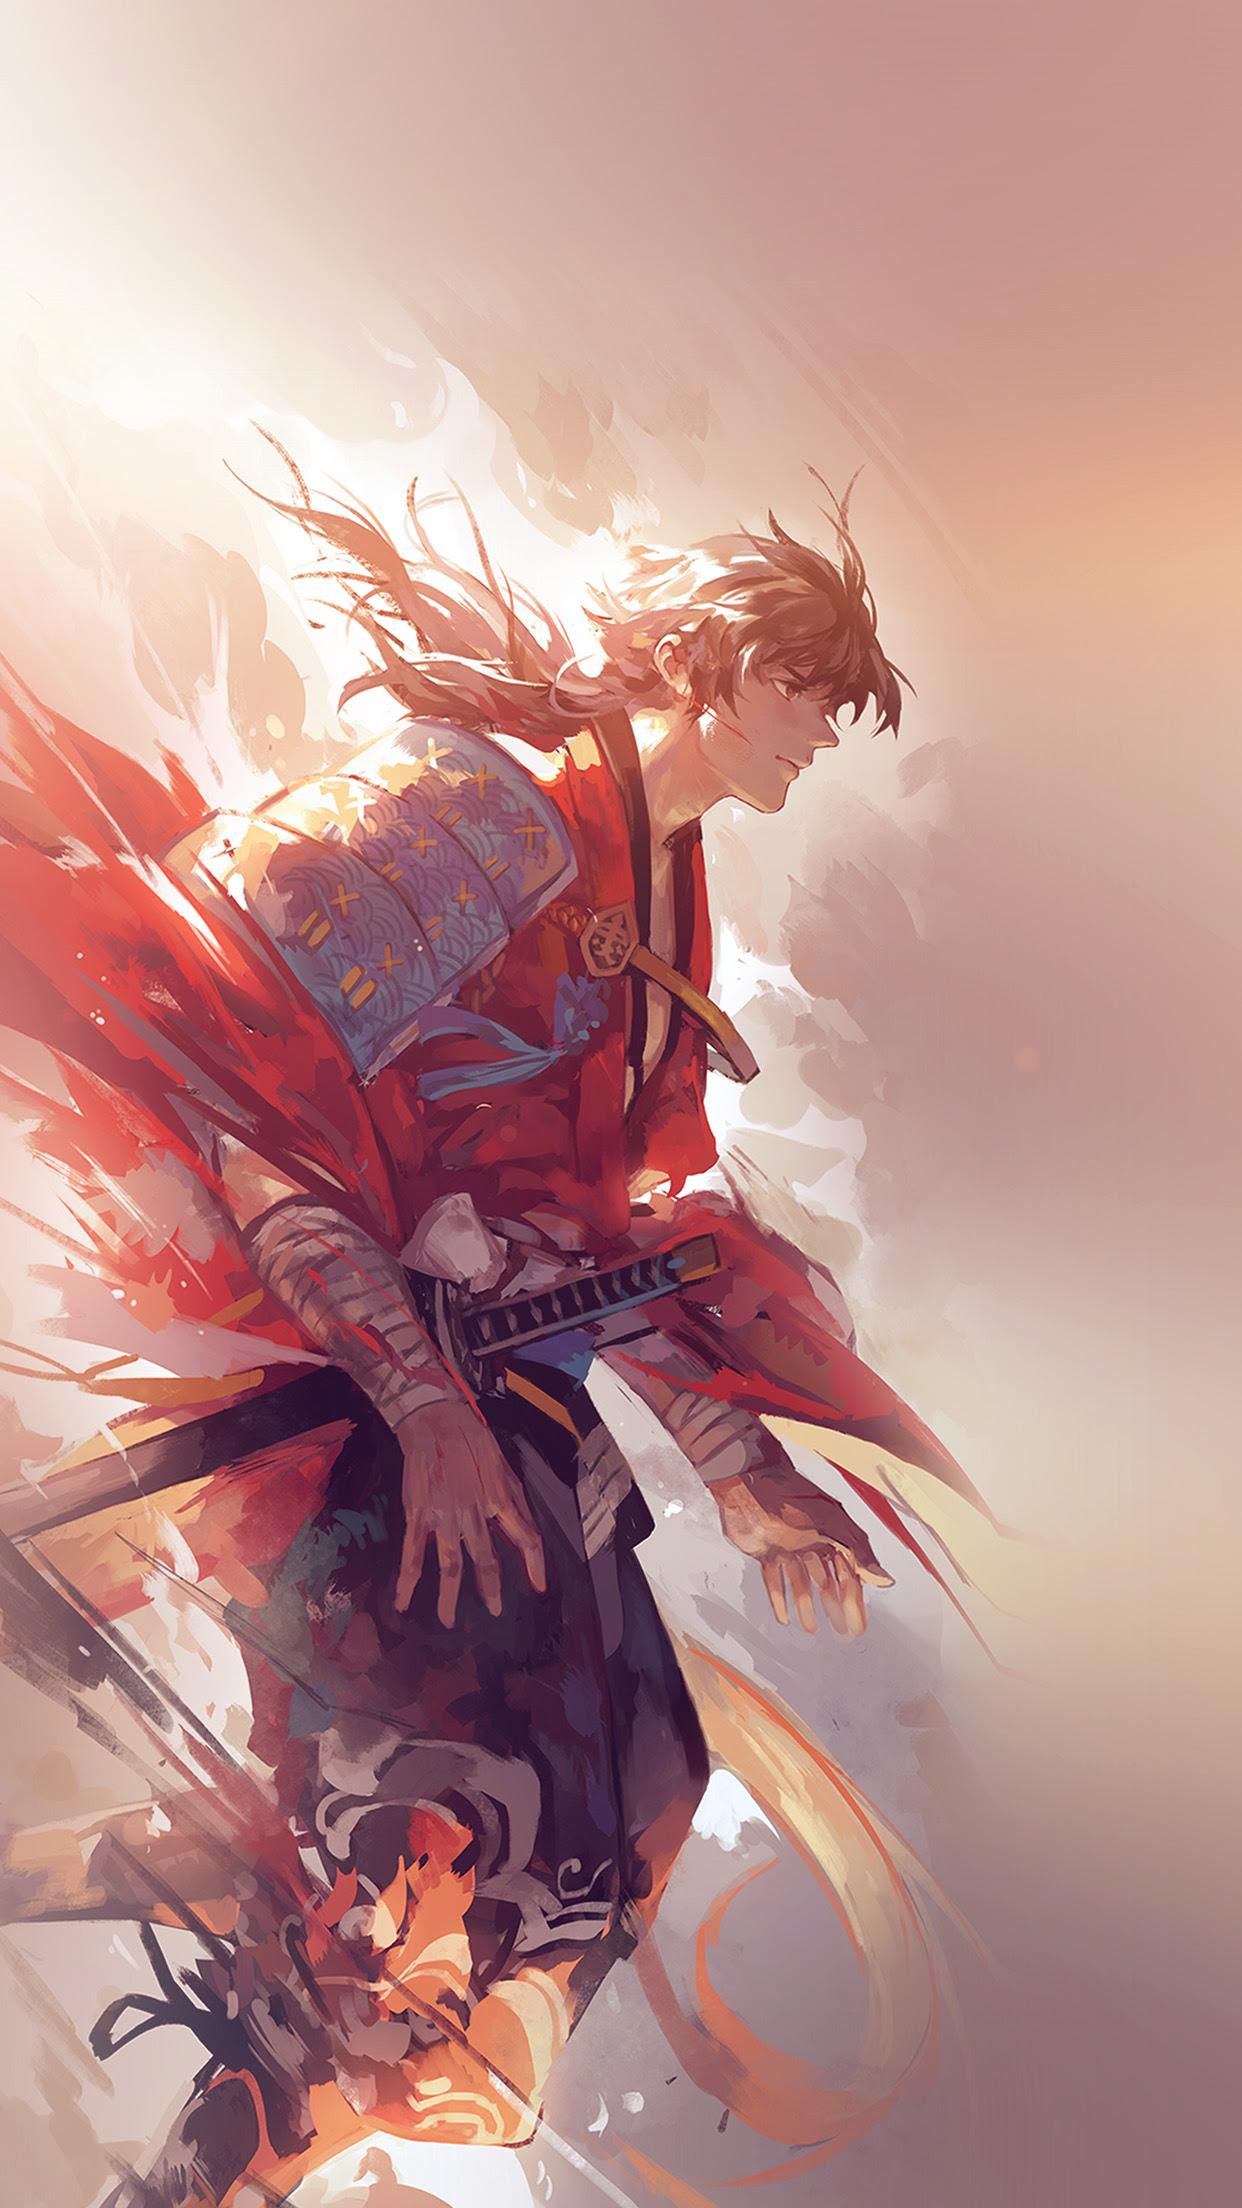 aw64-hanyijie-hero-red-handsomeillustration-art-anime ...